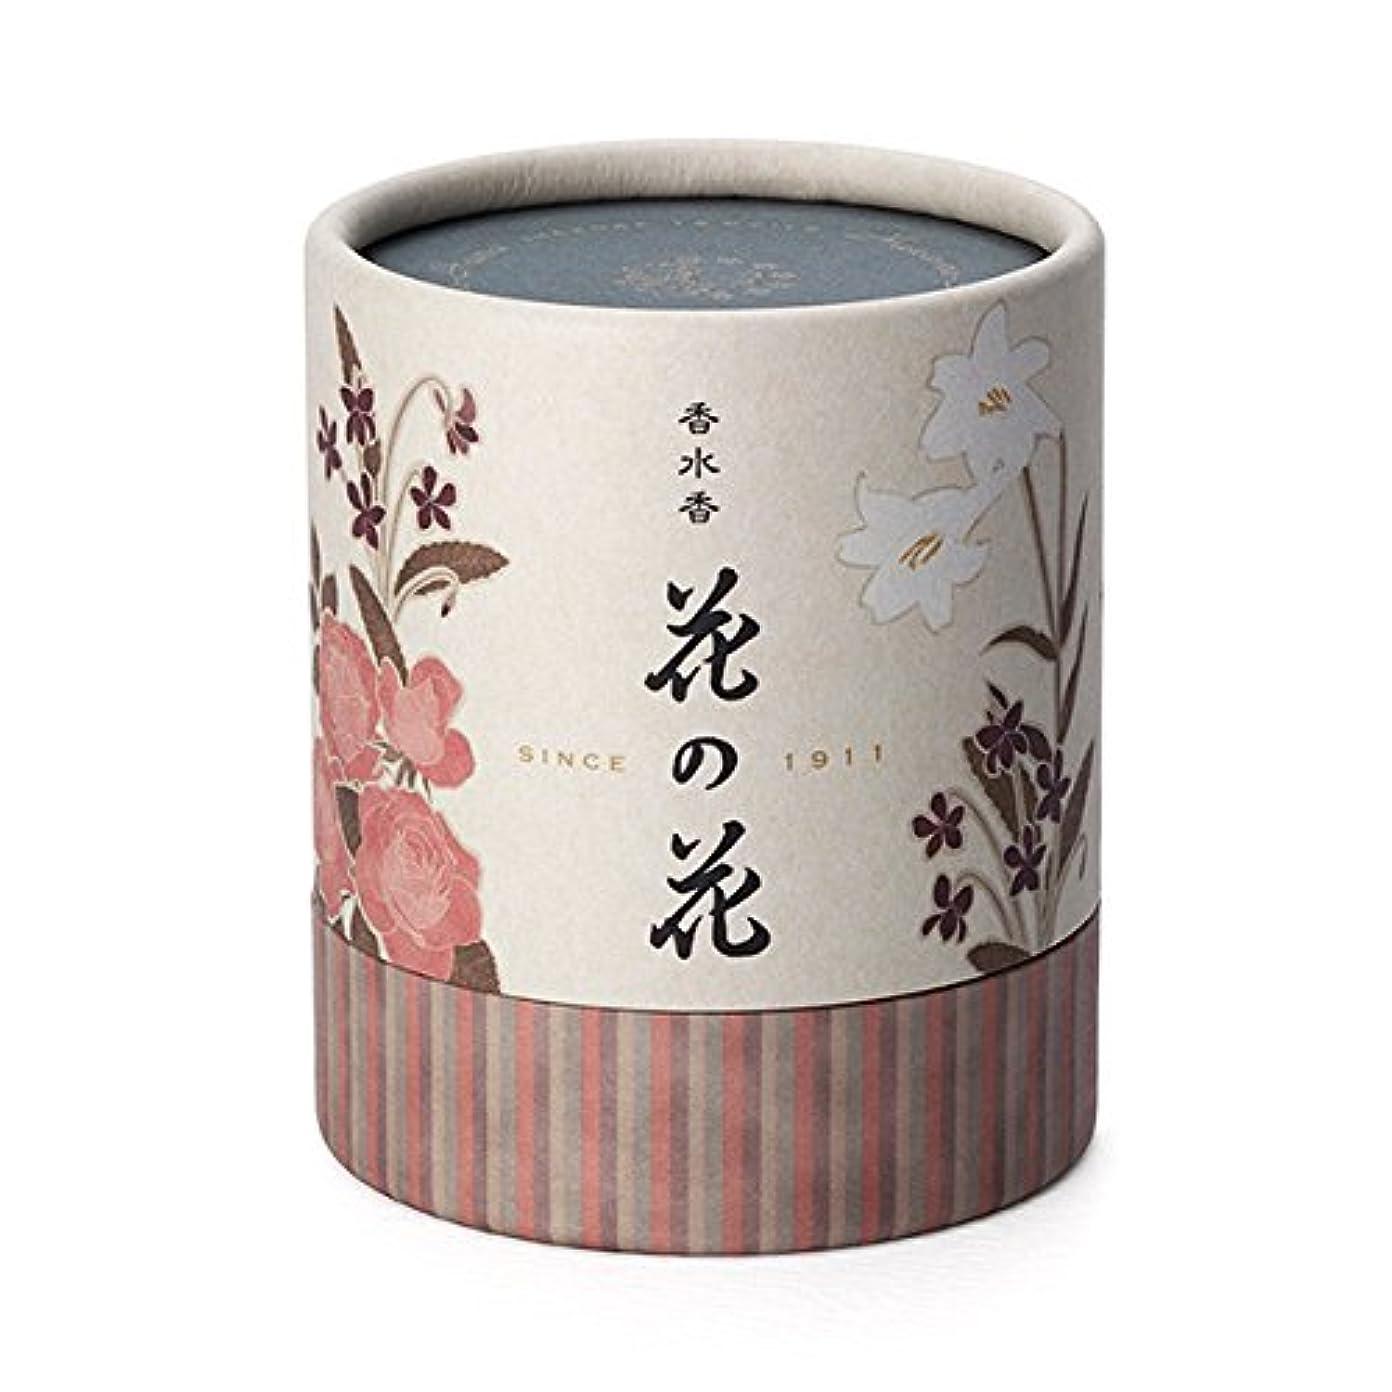 予防接種胚芽毒性日本香堂 香水香 花の花 3種入 うず巻12巻入 香立付( 30003)